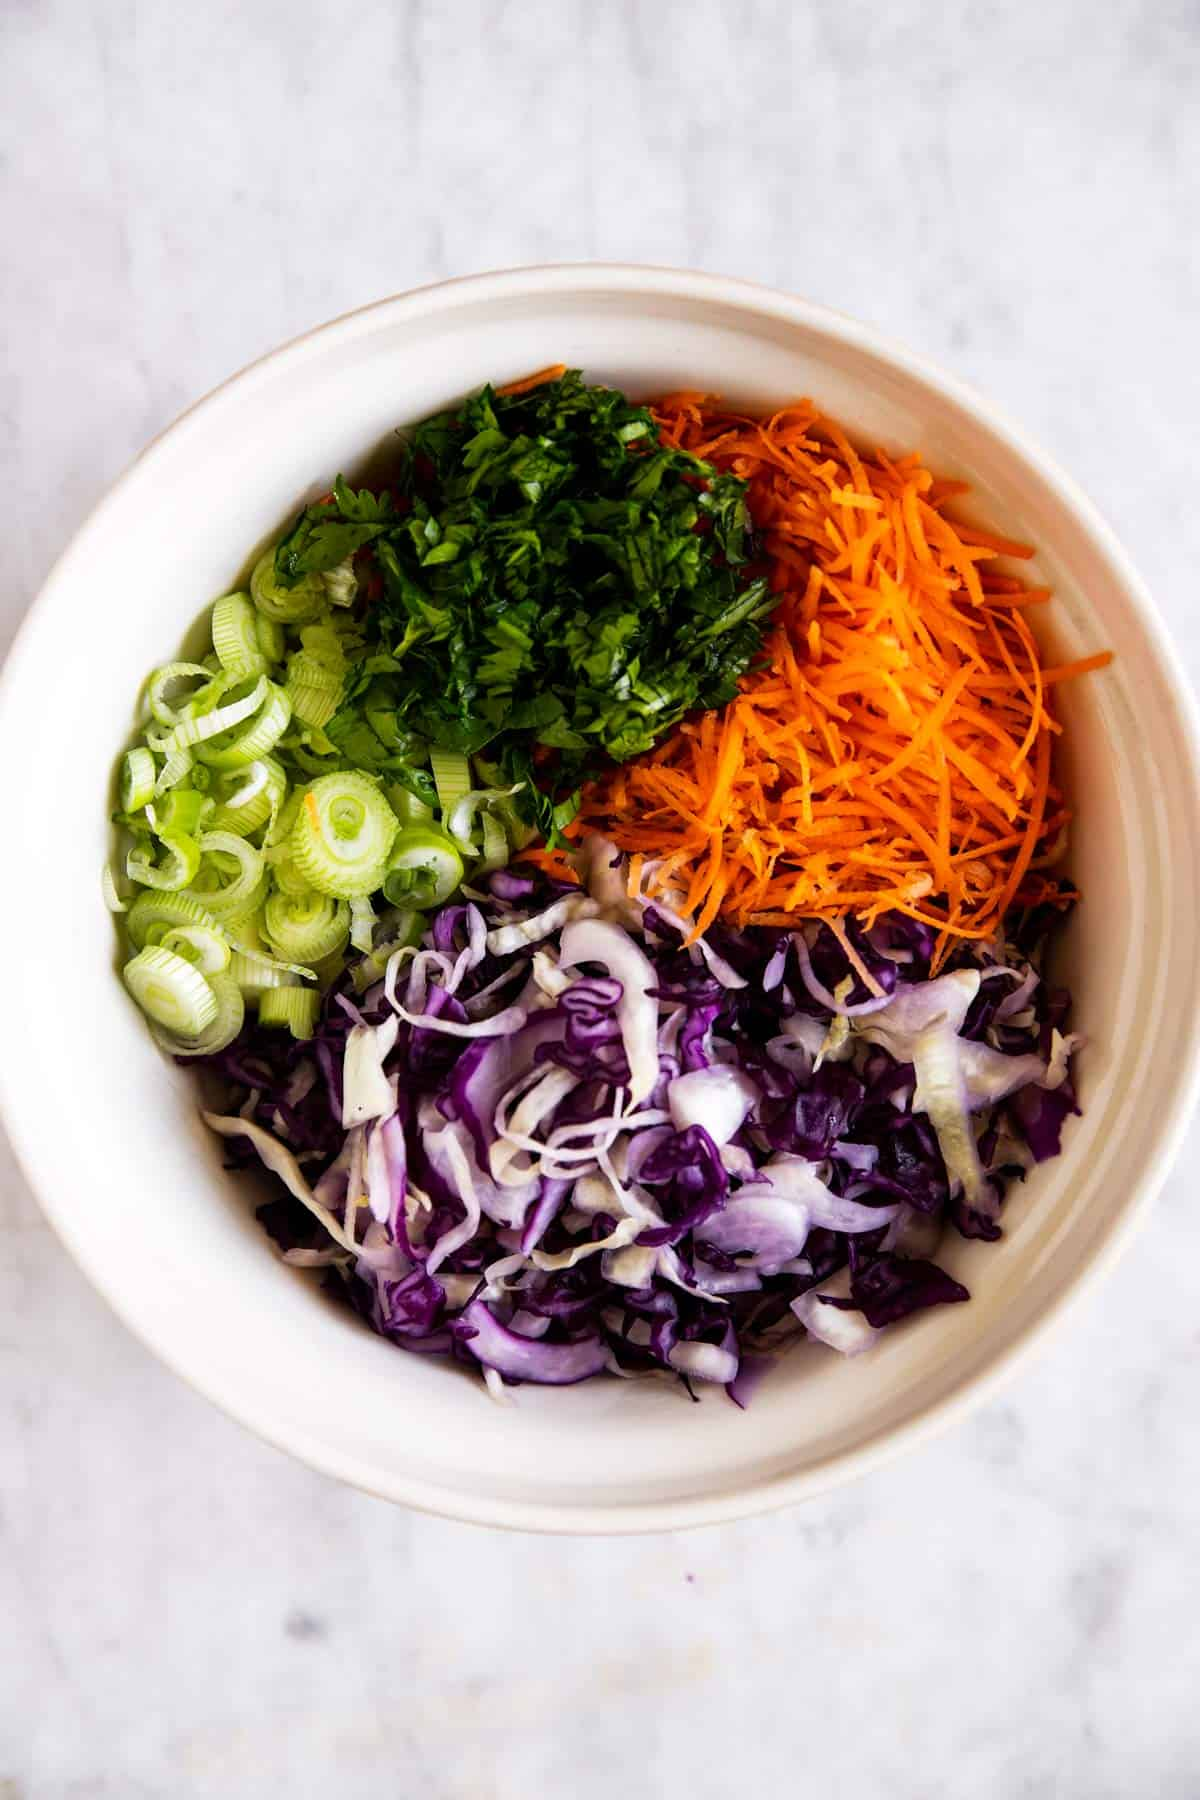 salad ingredients for cilantro lime slaw in salad bowl